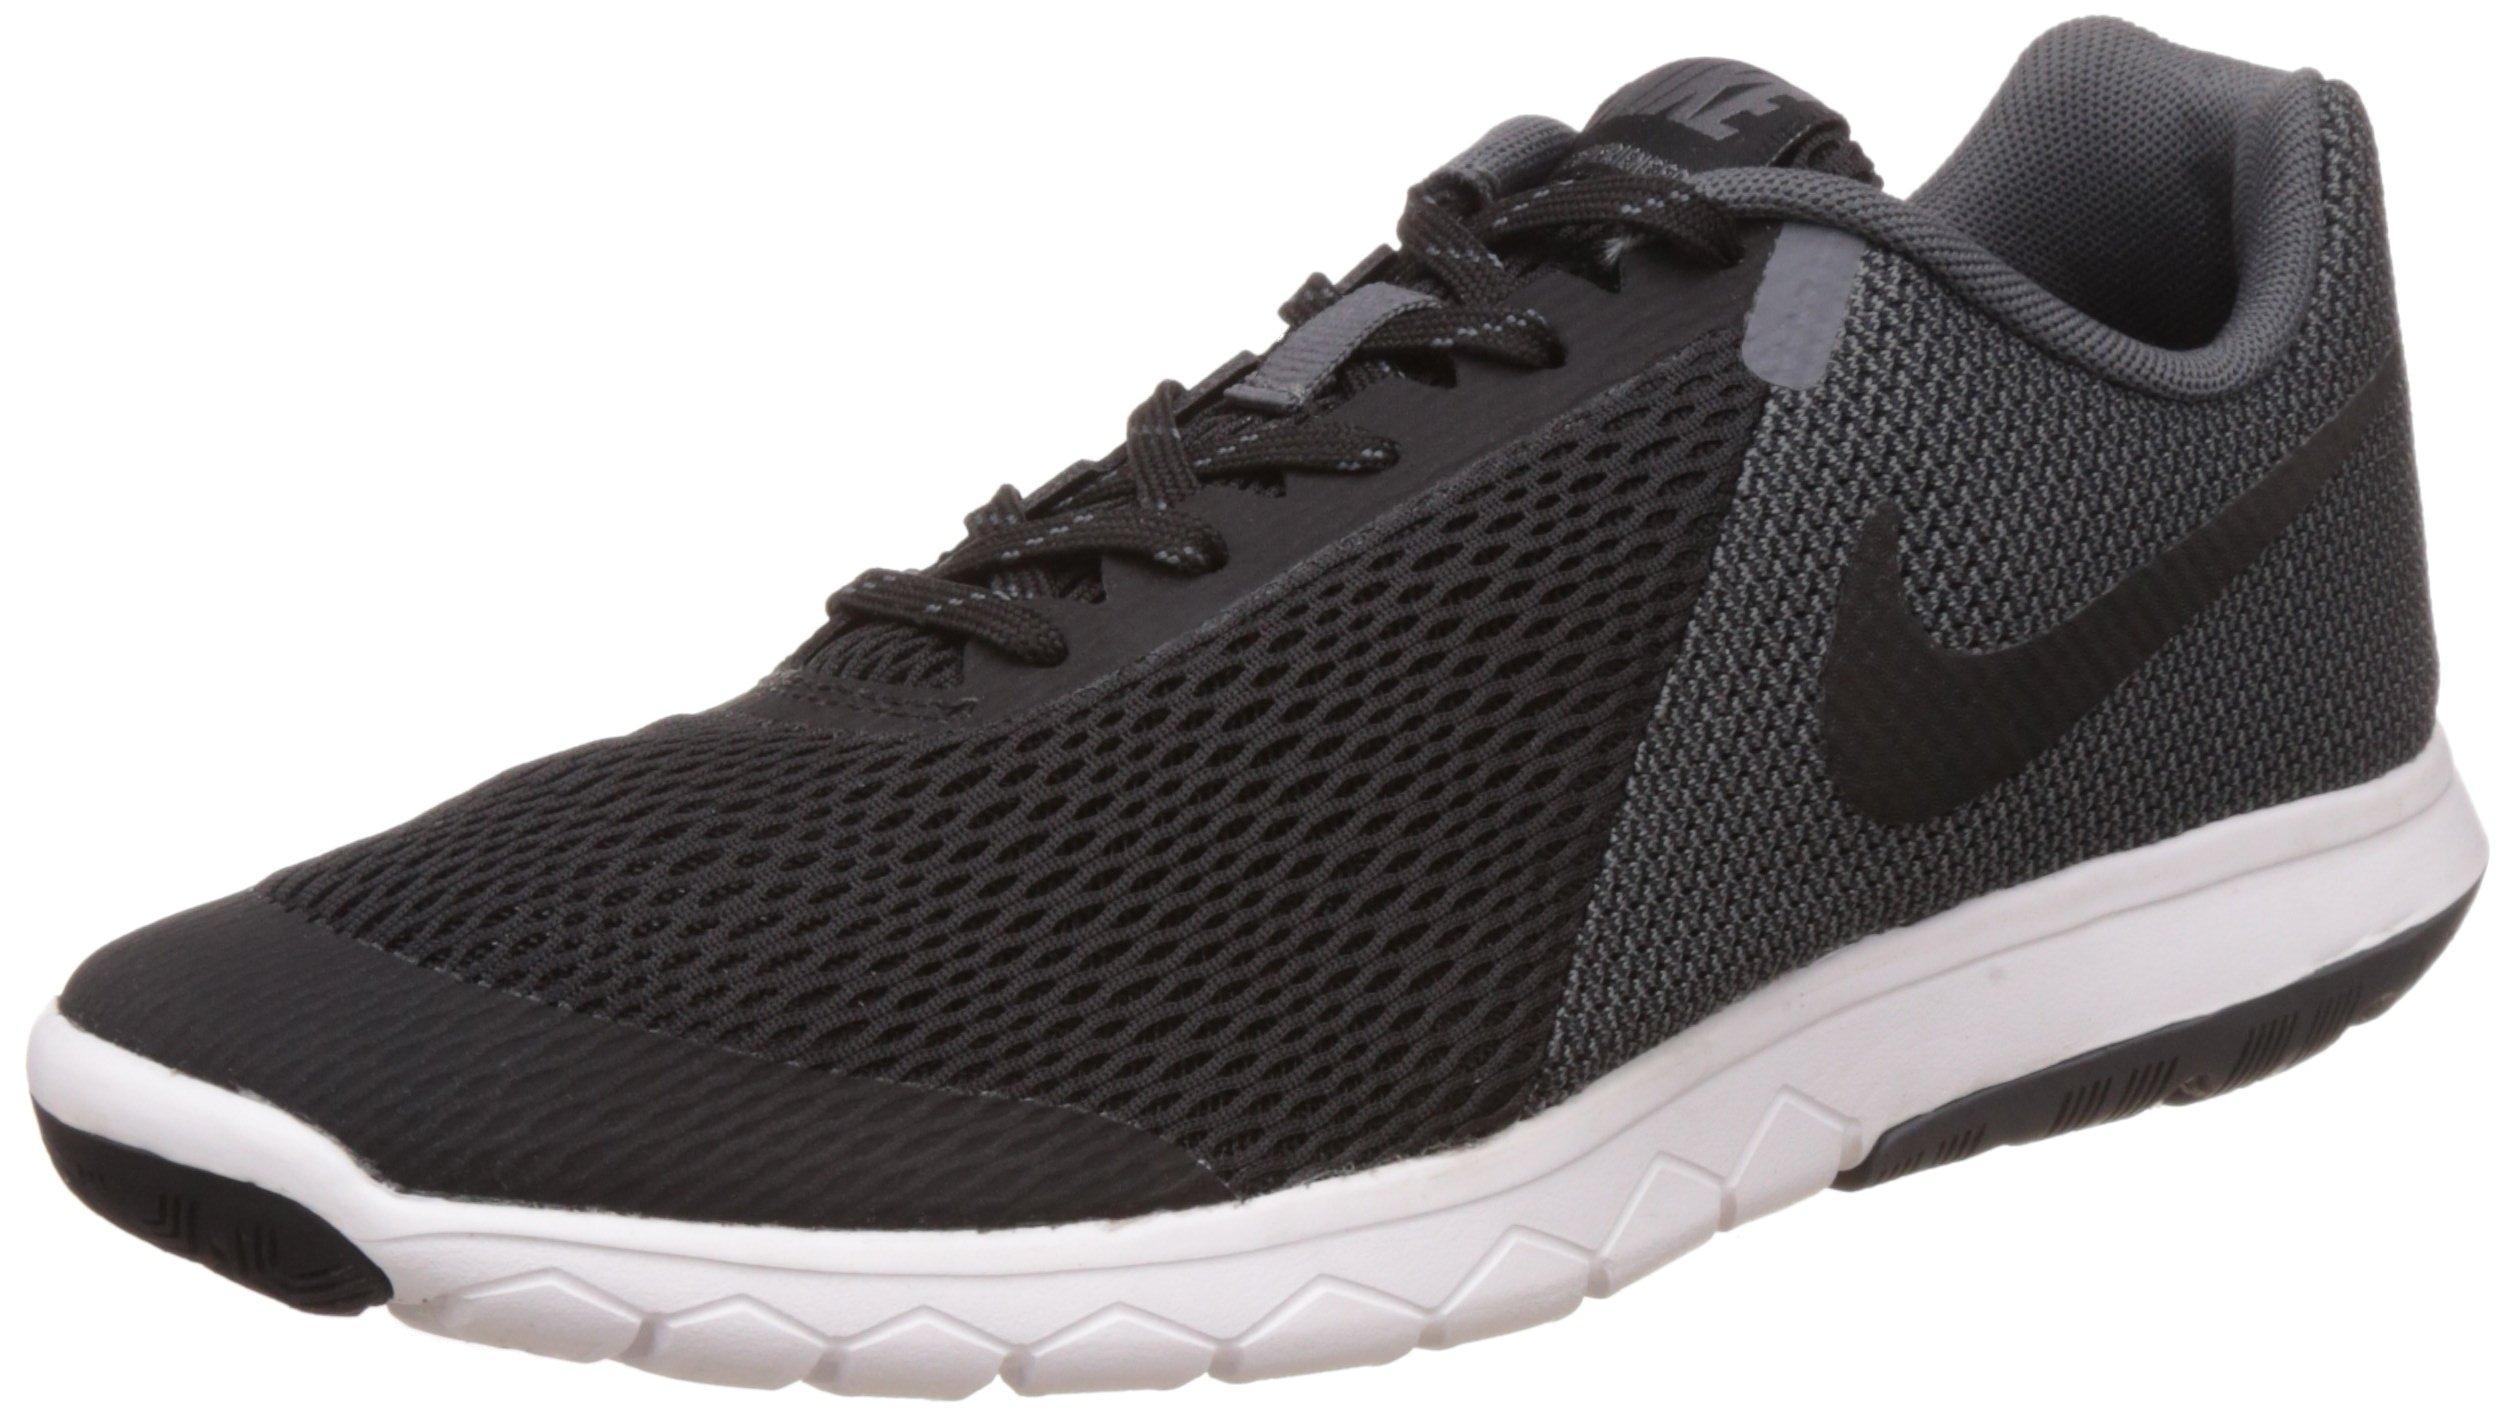 3a85273a27b20 Galleon - Nike Men's Flex Experience RN 4 Black/Black Dark Grey ...